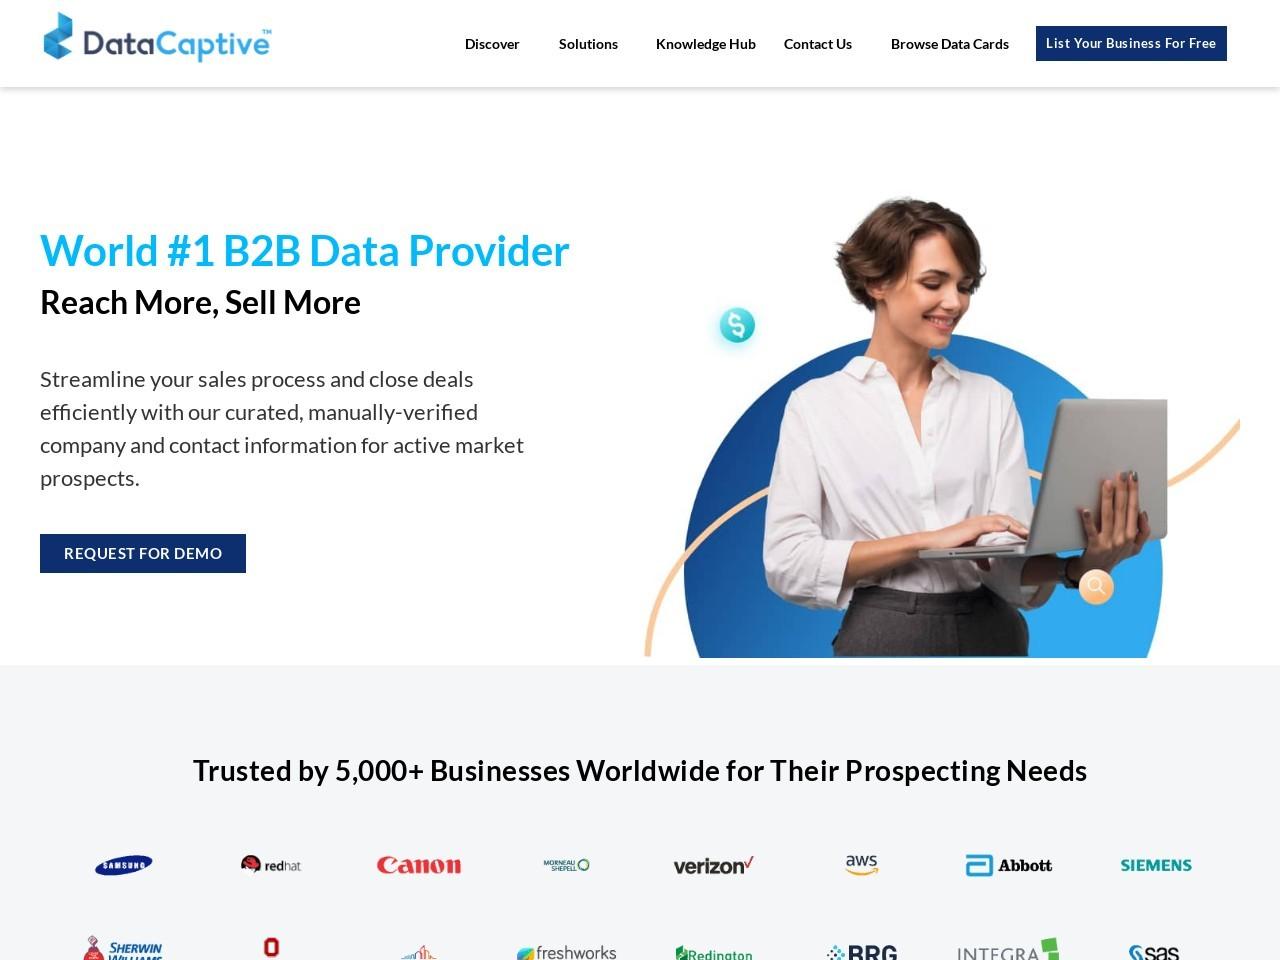 MailChimp Users Email List | MailChimp Users Custom List